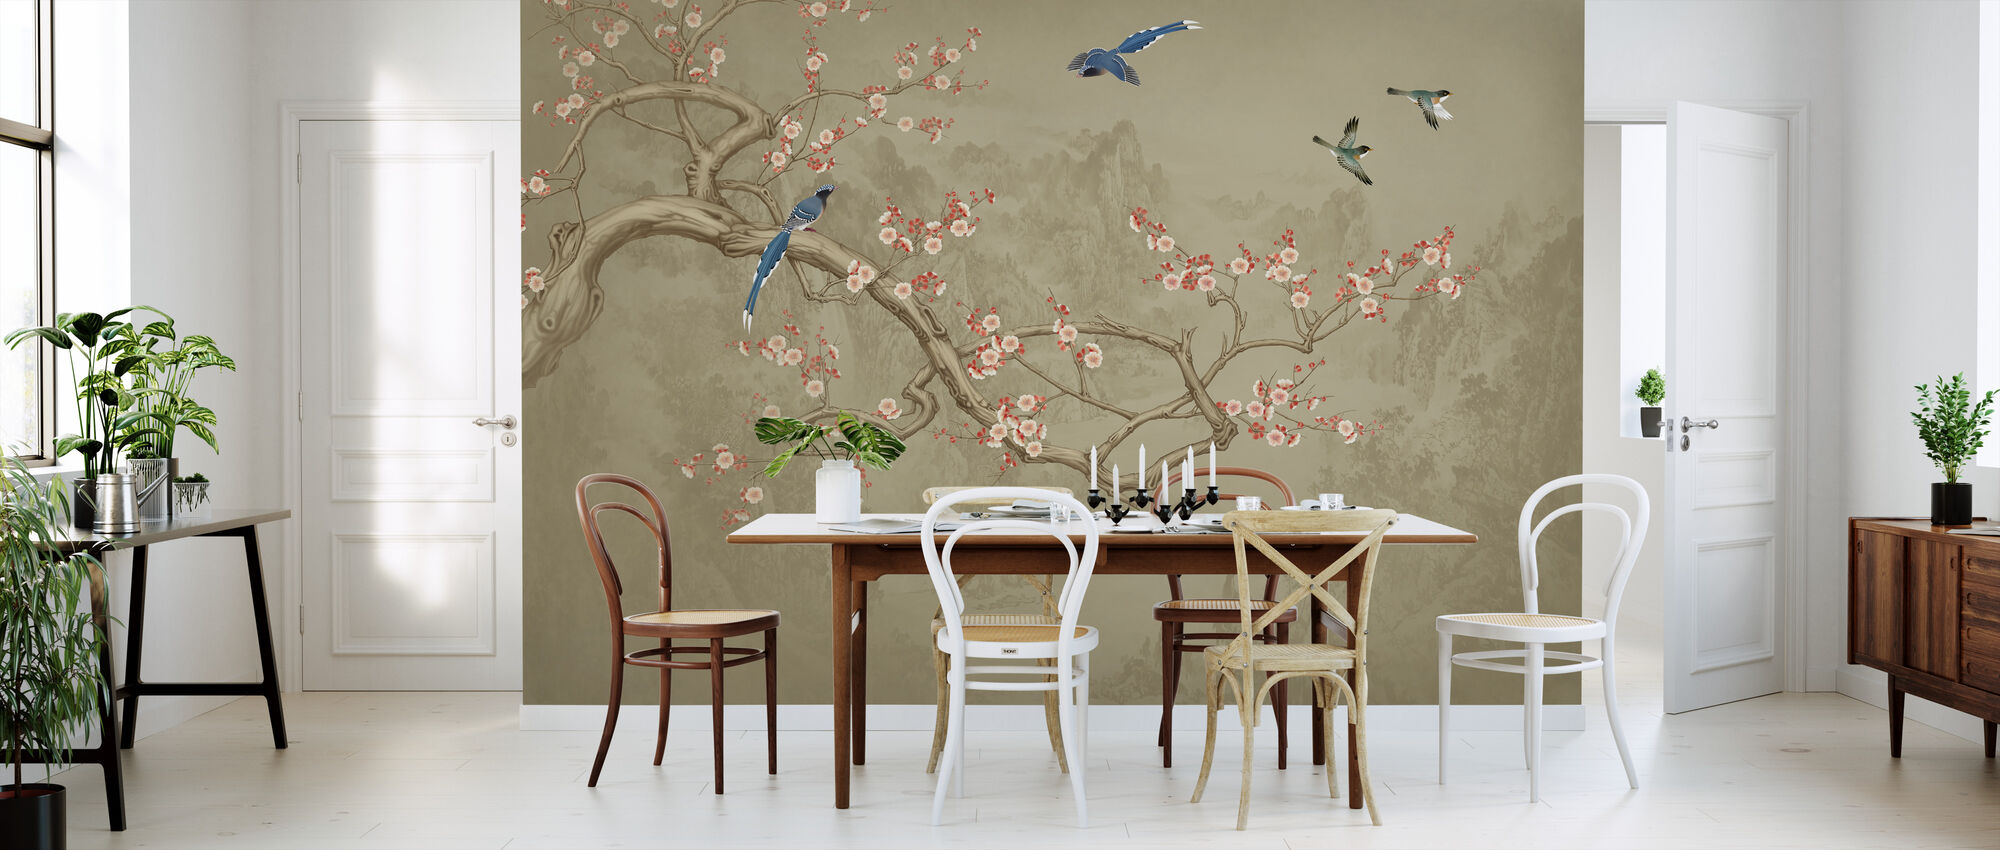 Birds heights - Cocoa - Wallpaper - Kitchen